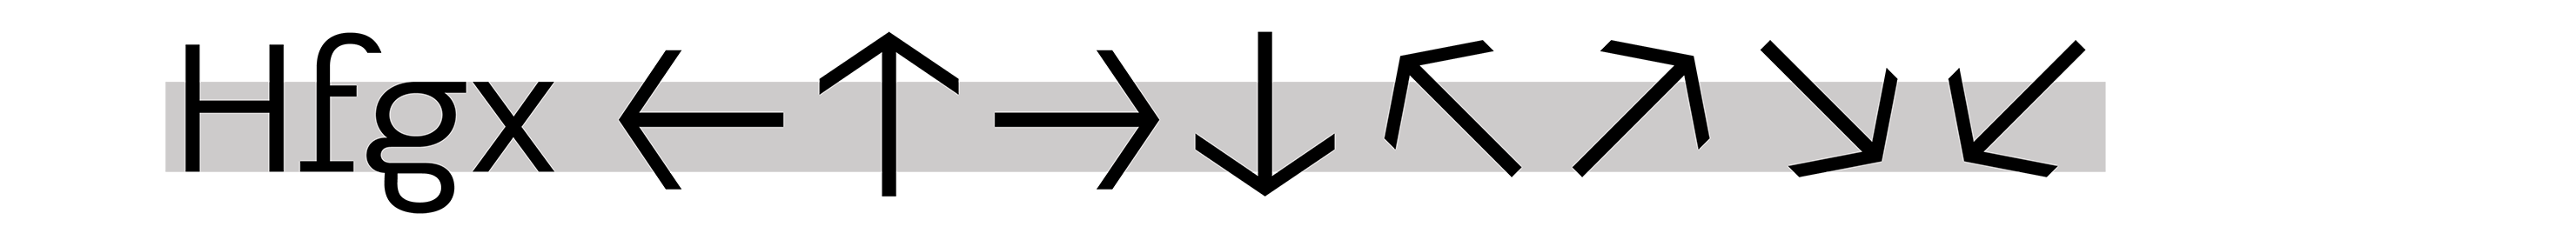 Typeface-Heimat-Sans-F18-Atlas-Font-Foundry